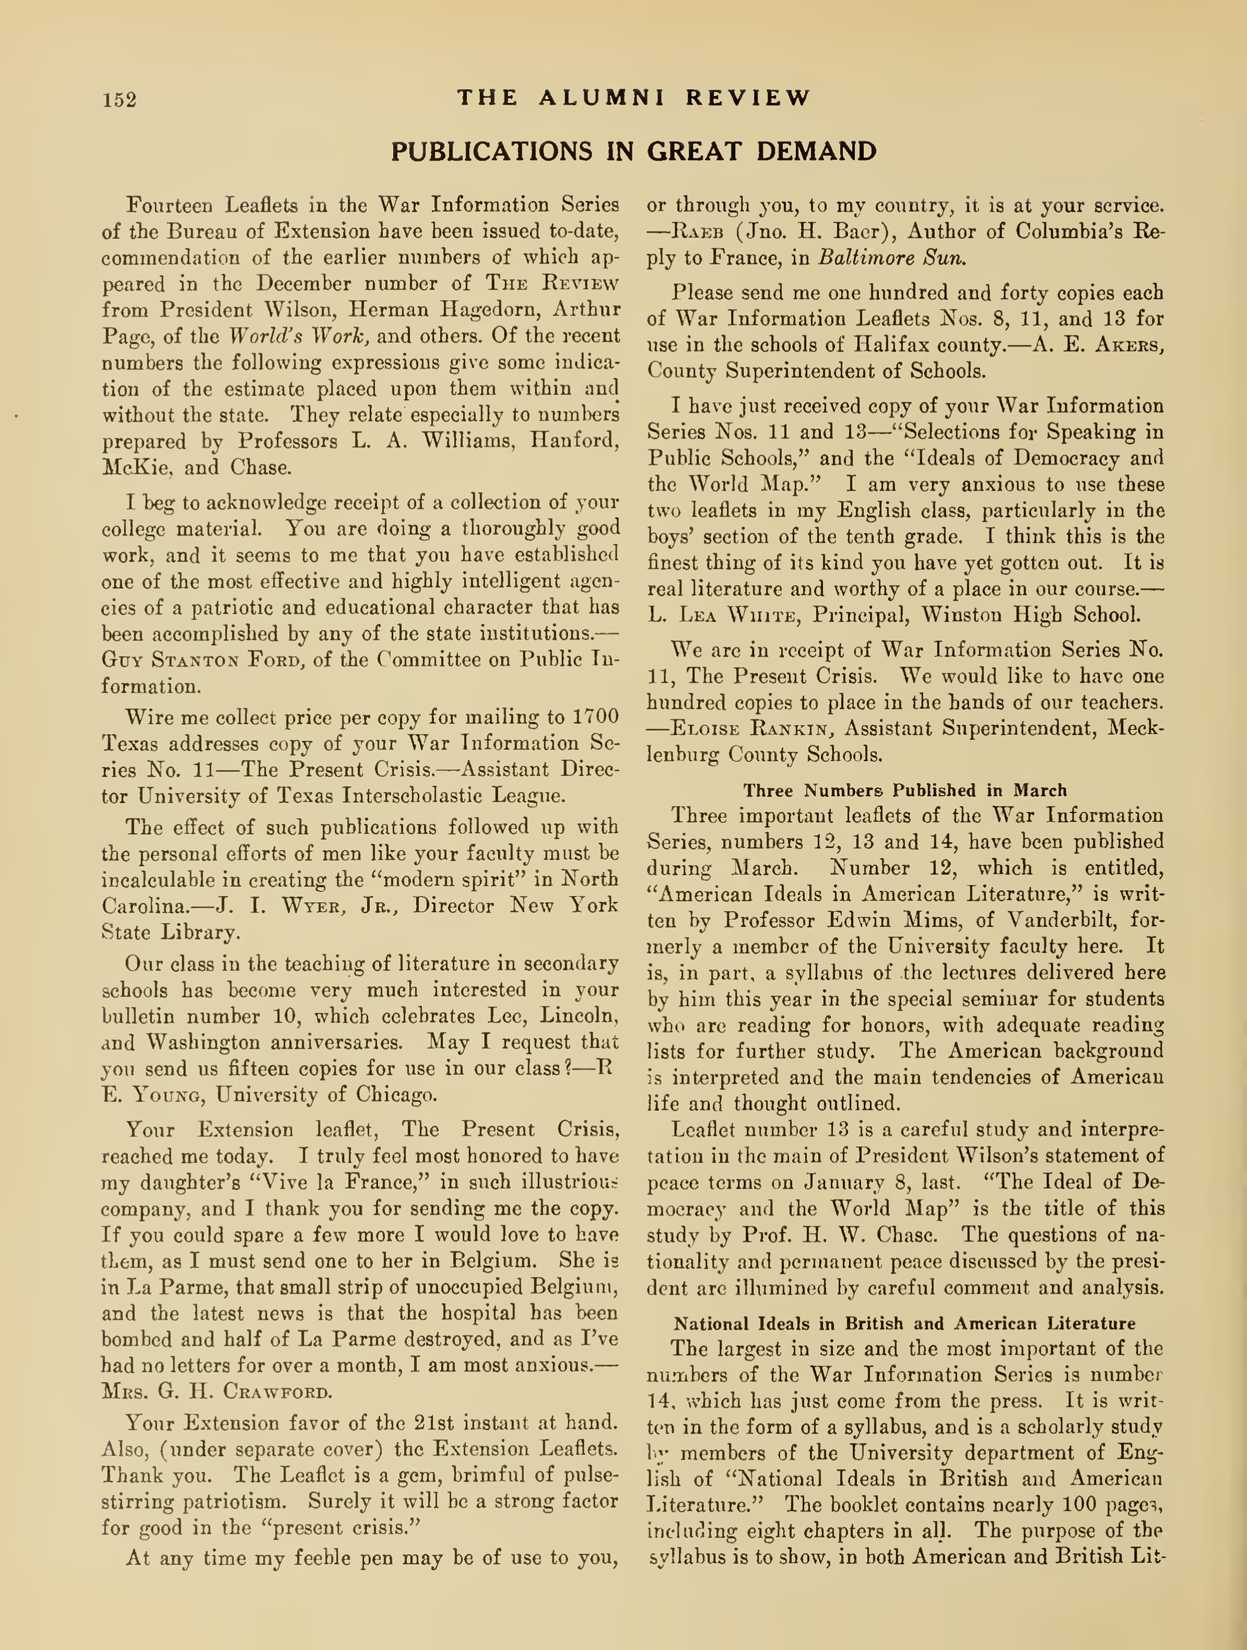 Carolina Alumni Review - March 1918 - page 152